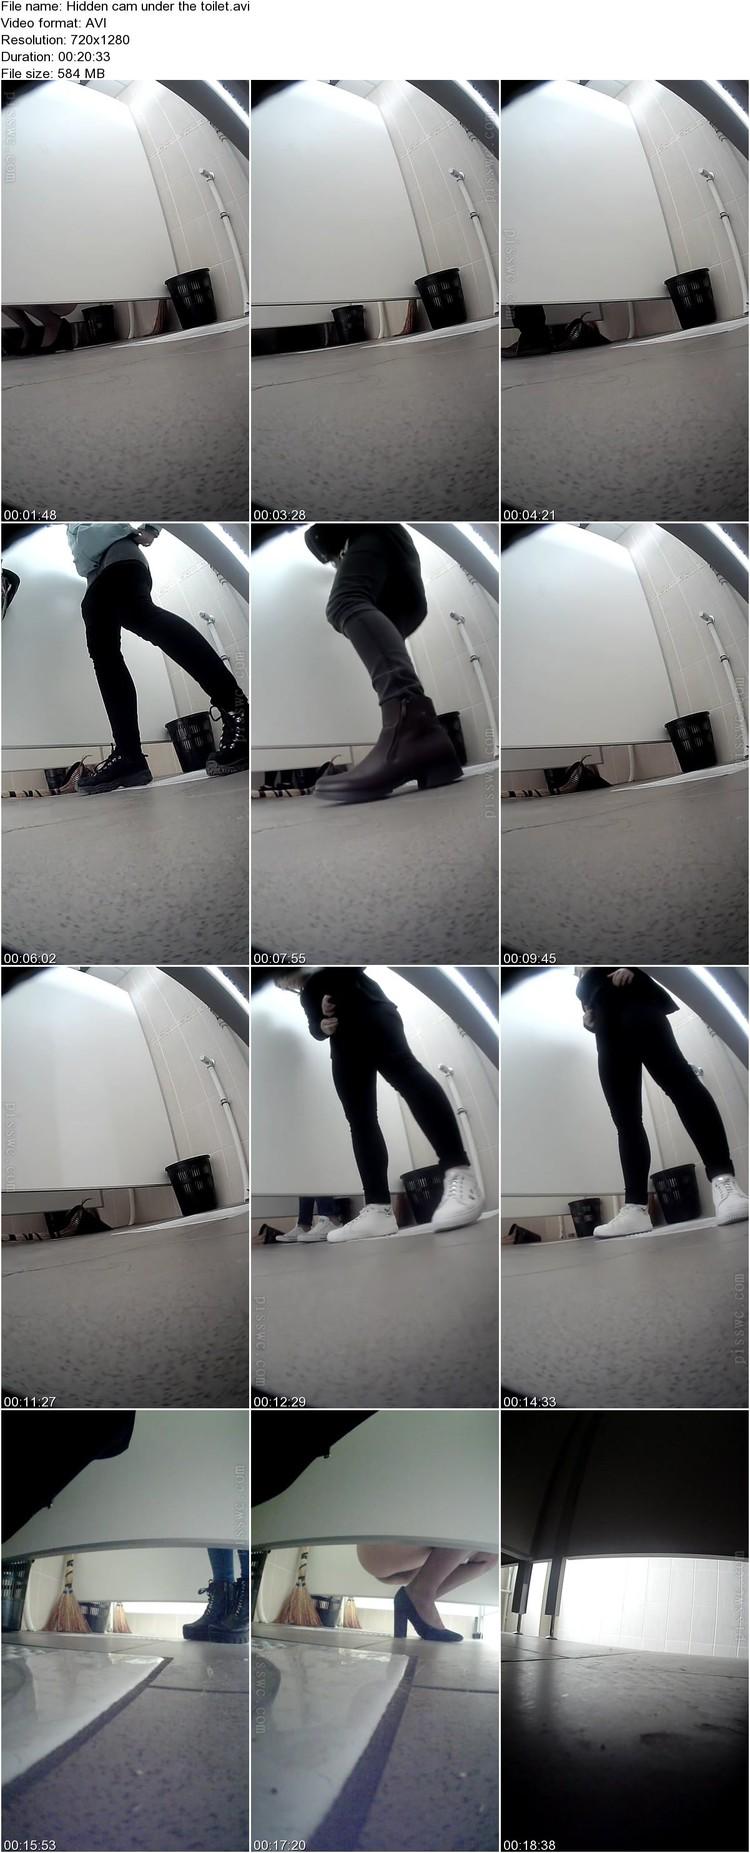 [Image: Hidden_cam_under_the_toilet.avi_l.jpg]